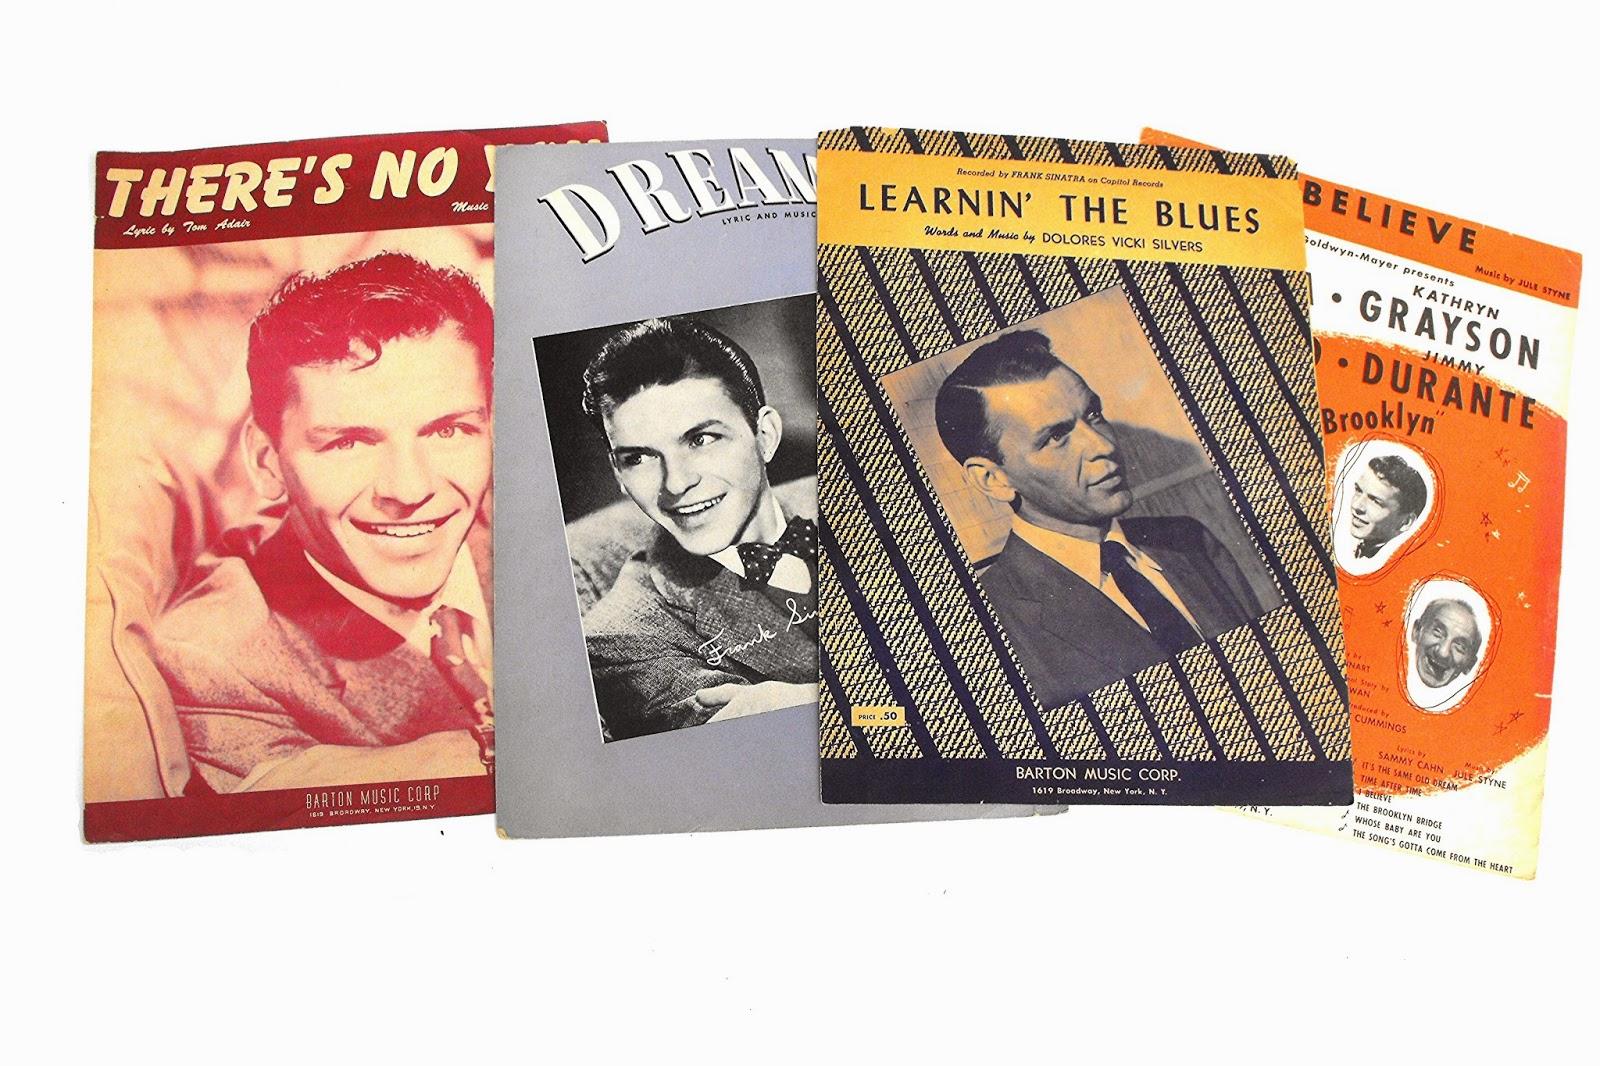 https://www.etsy.com/listing/173125557/1940s-50s-frank-sinatra-sheet-music-set